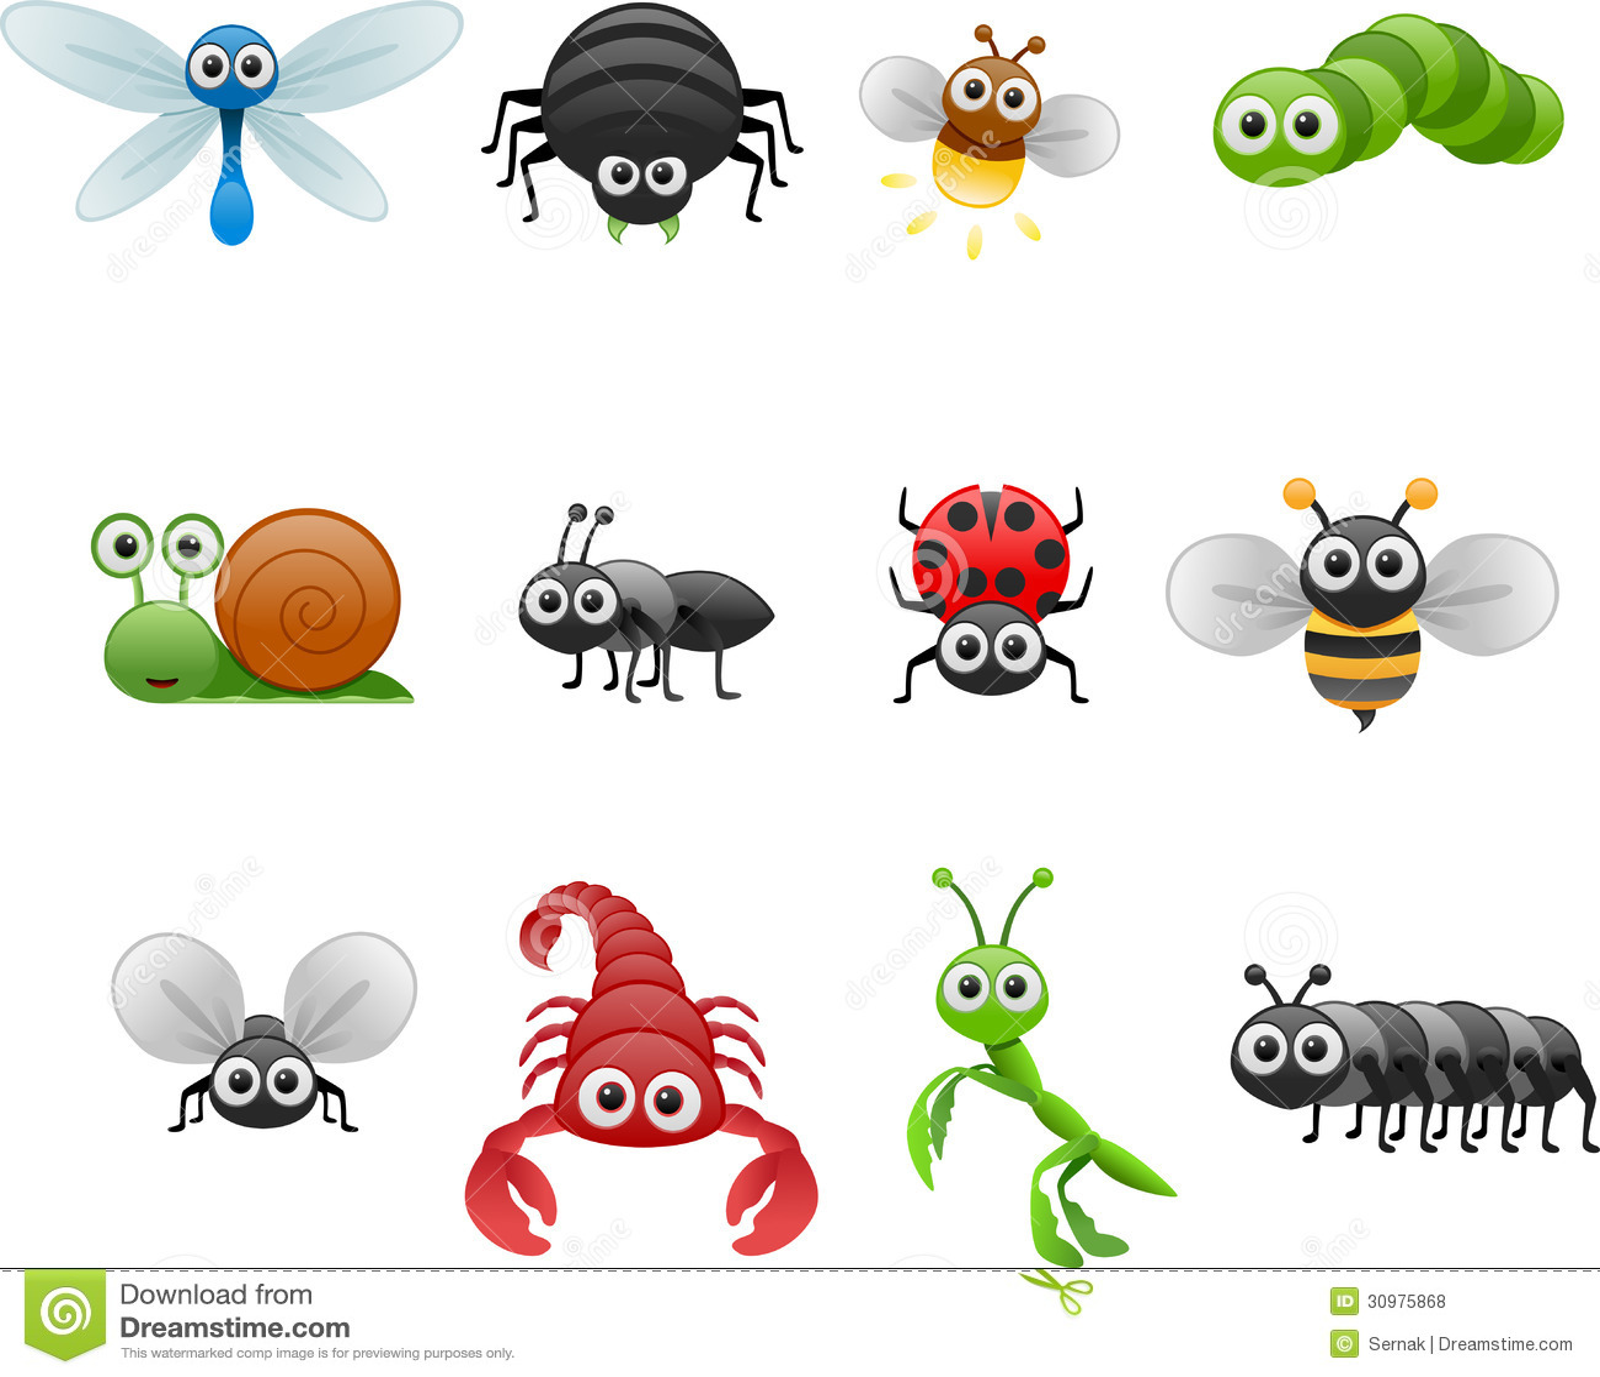 Cartoon insect set stock vector. Illustration of cartoon ...